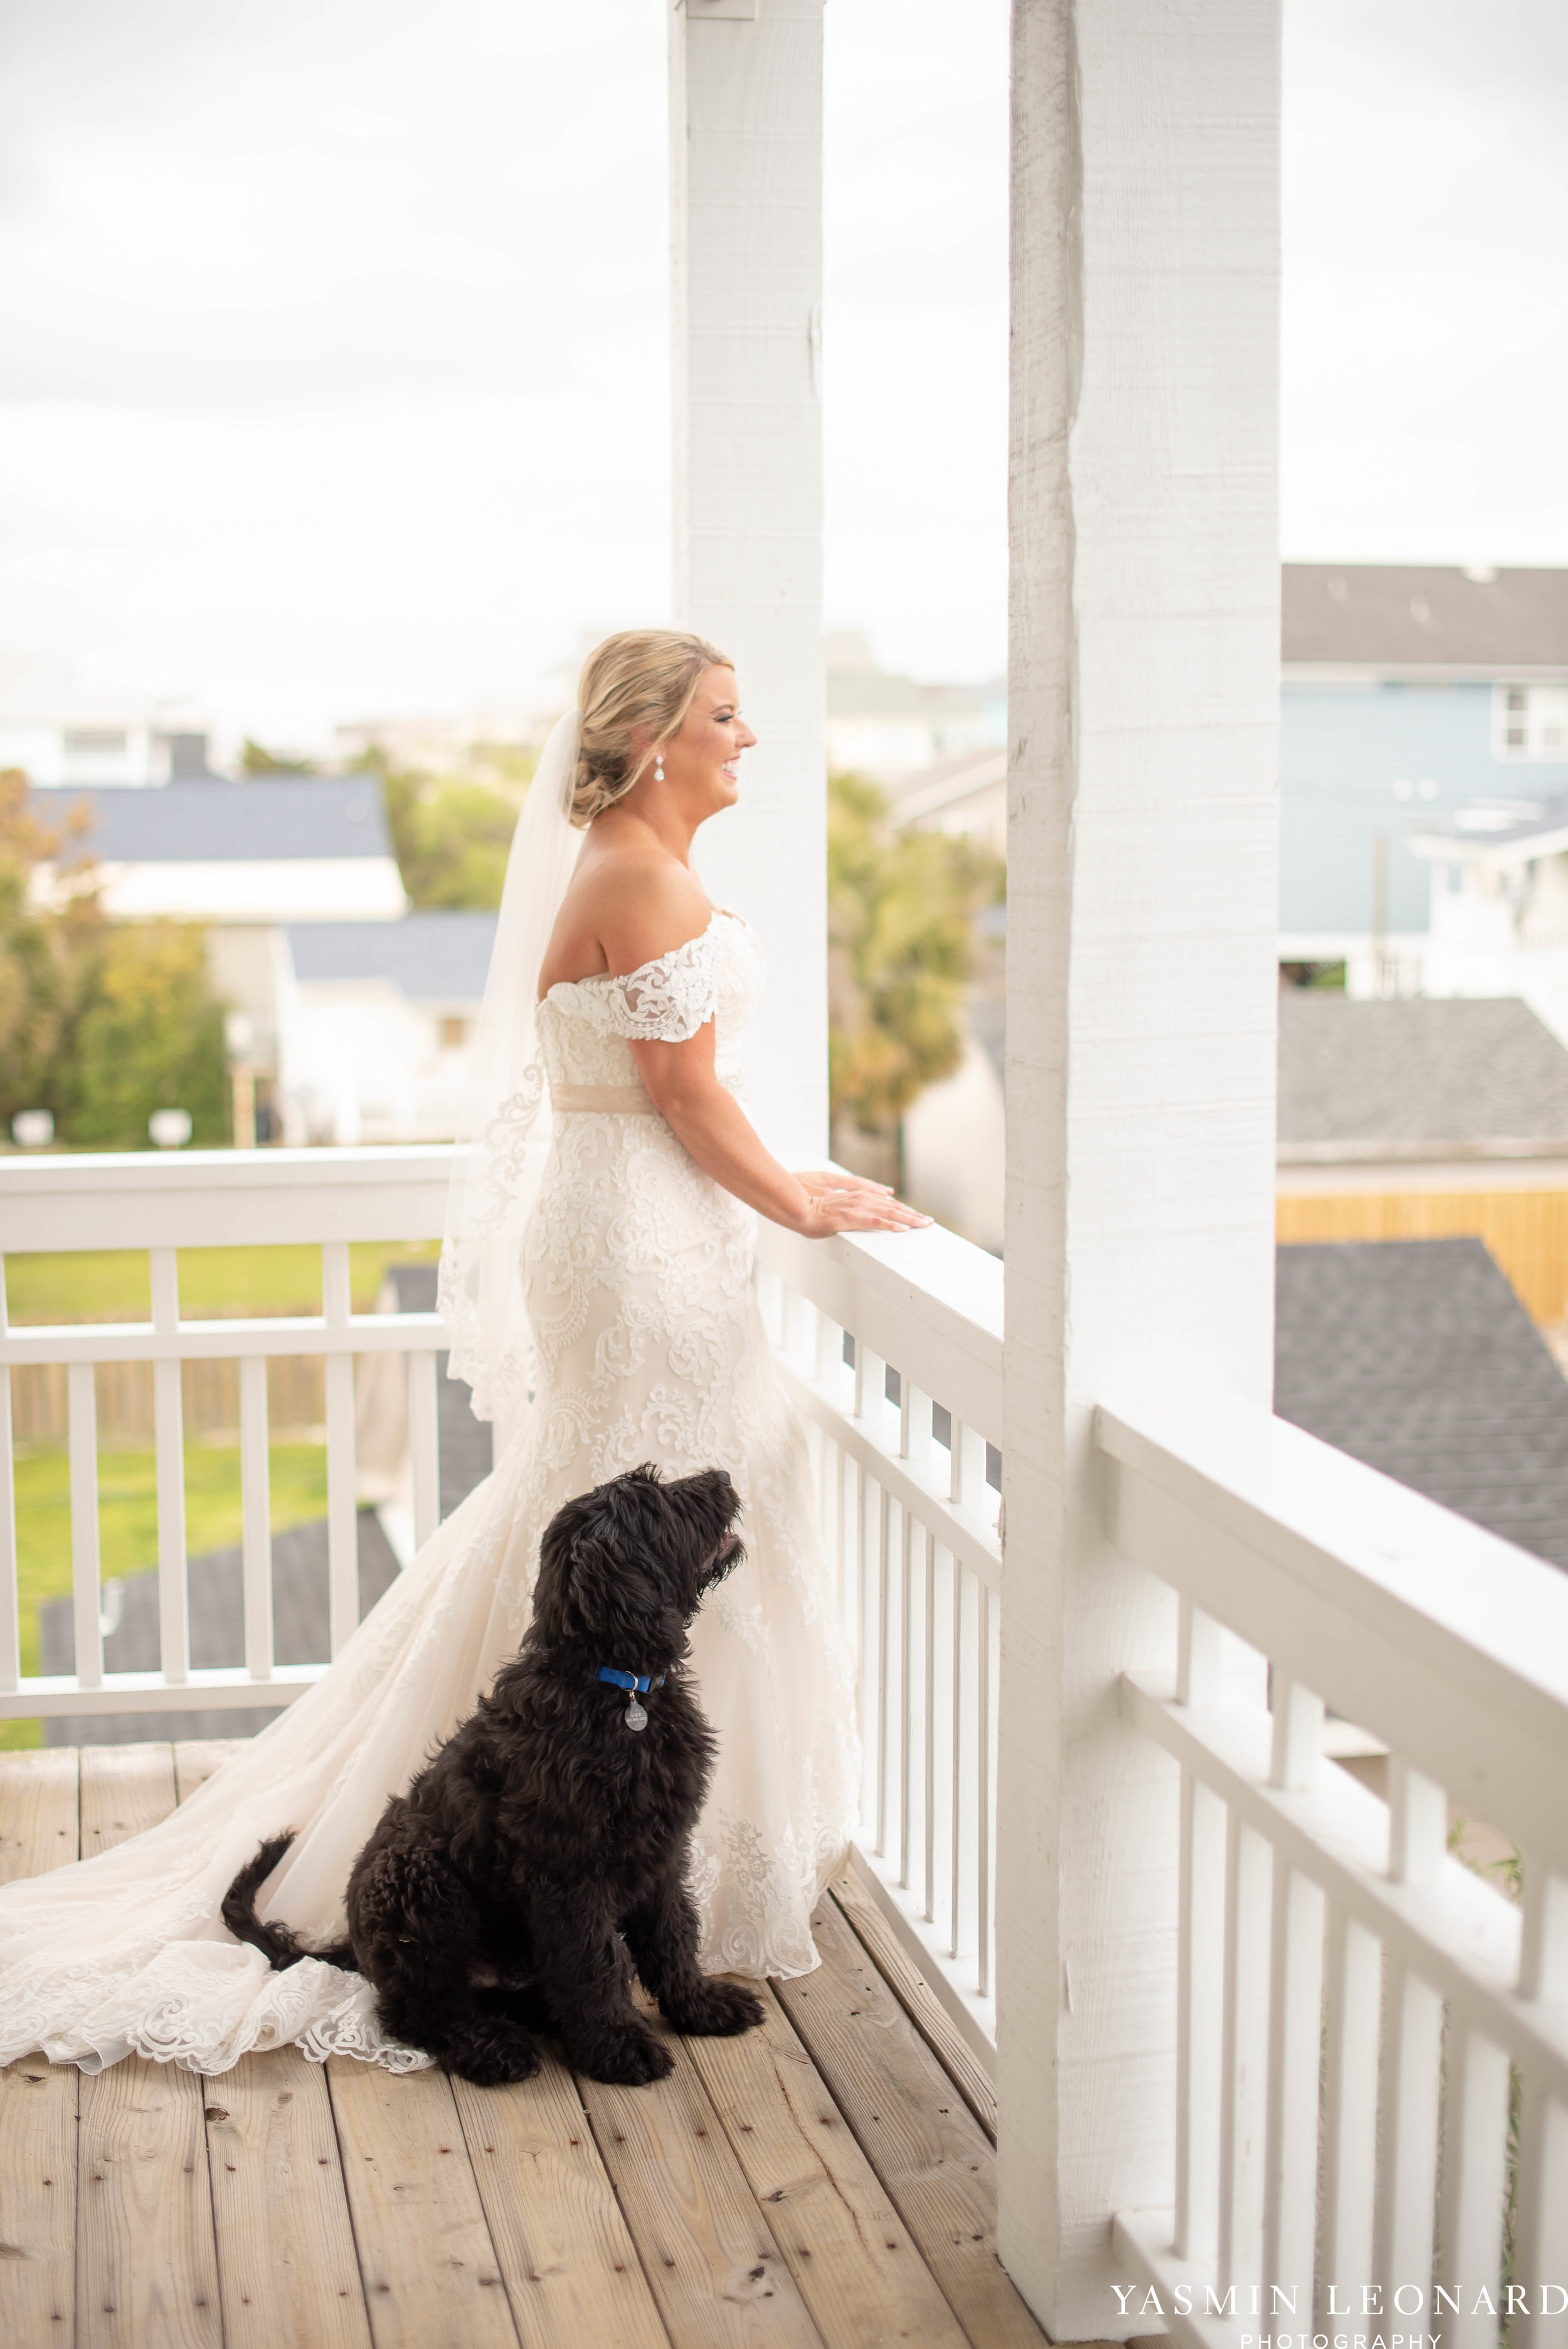 Carolina Beach Wedding - Fort Fisher Wedding - NC Acquarium - Beach Wedding - NC Wedding - Beach Wedding Inspiration - Beach Bride-11.jpg